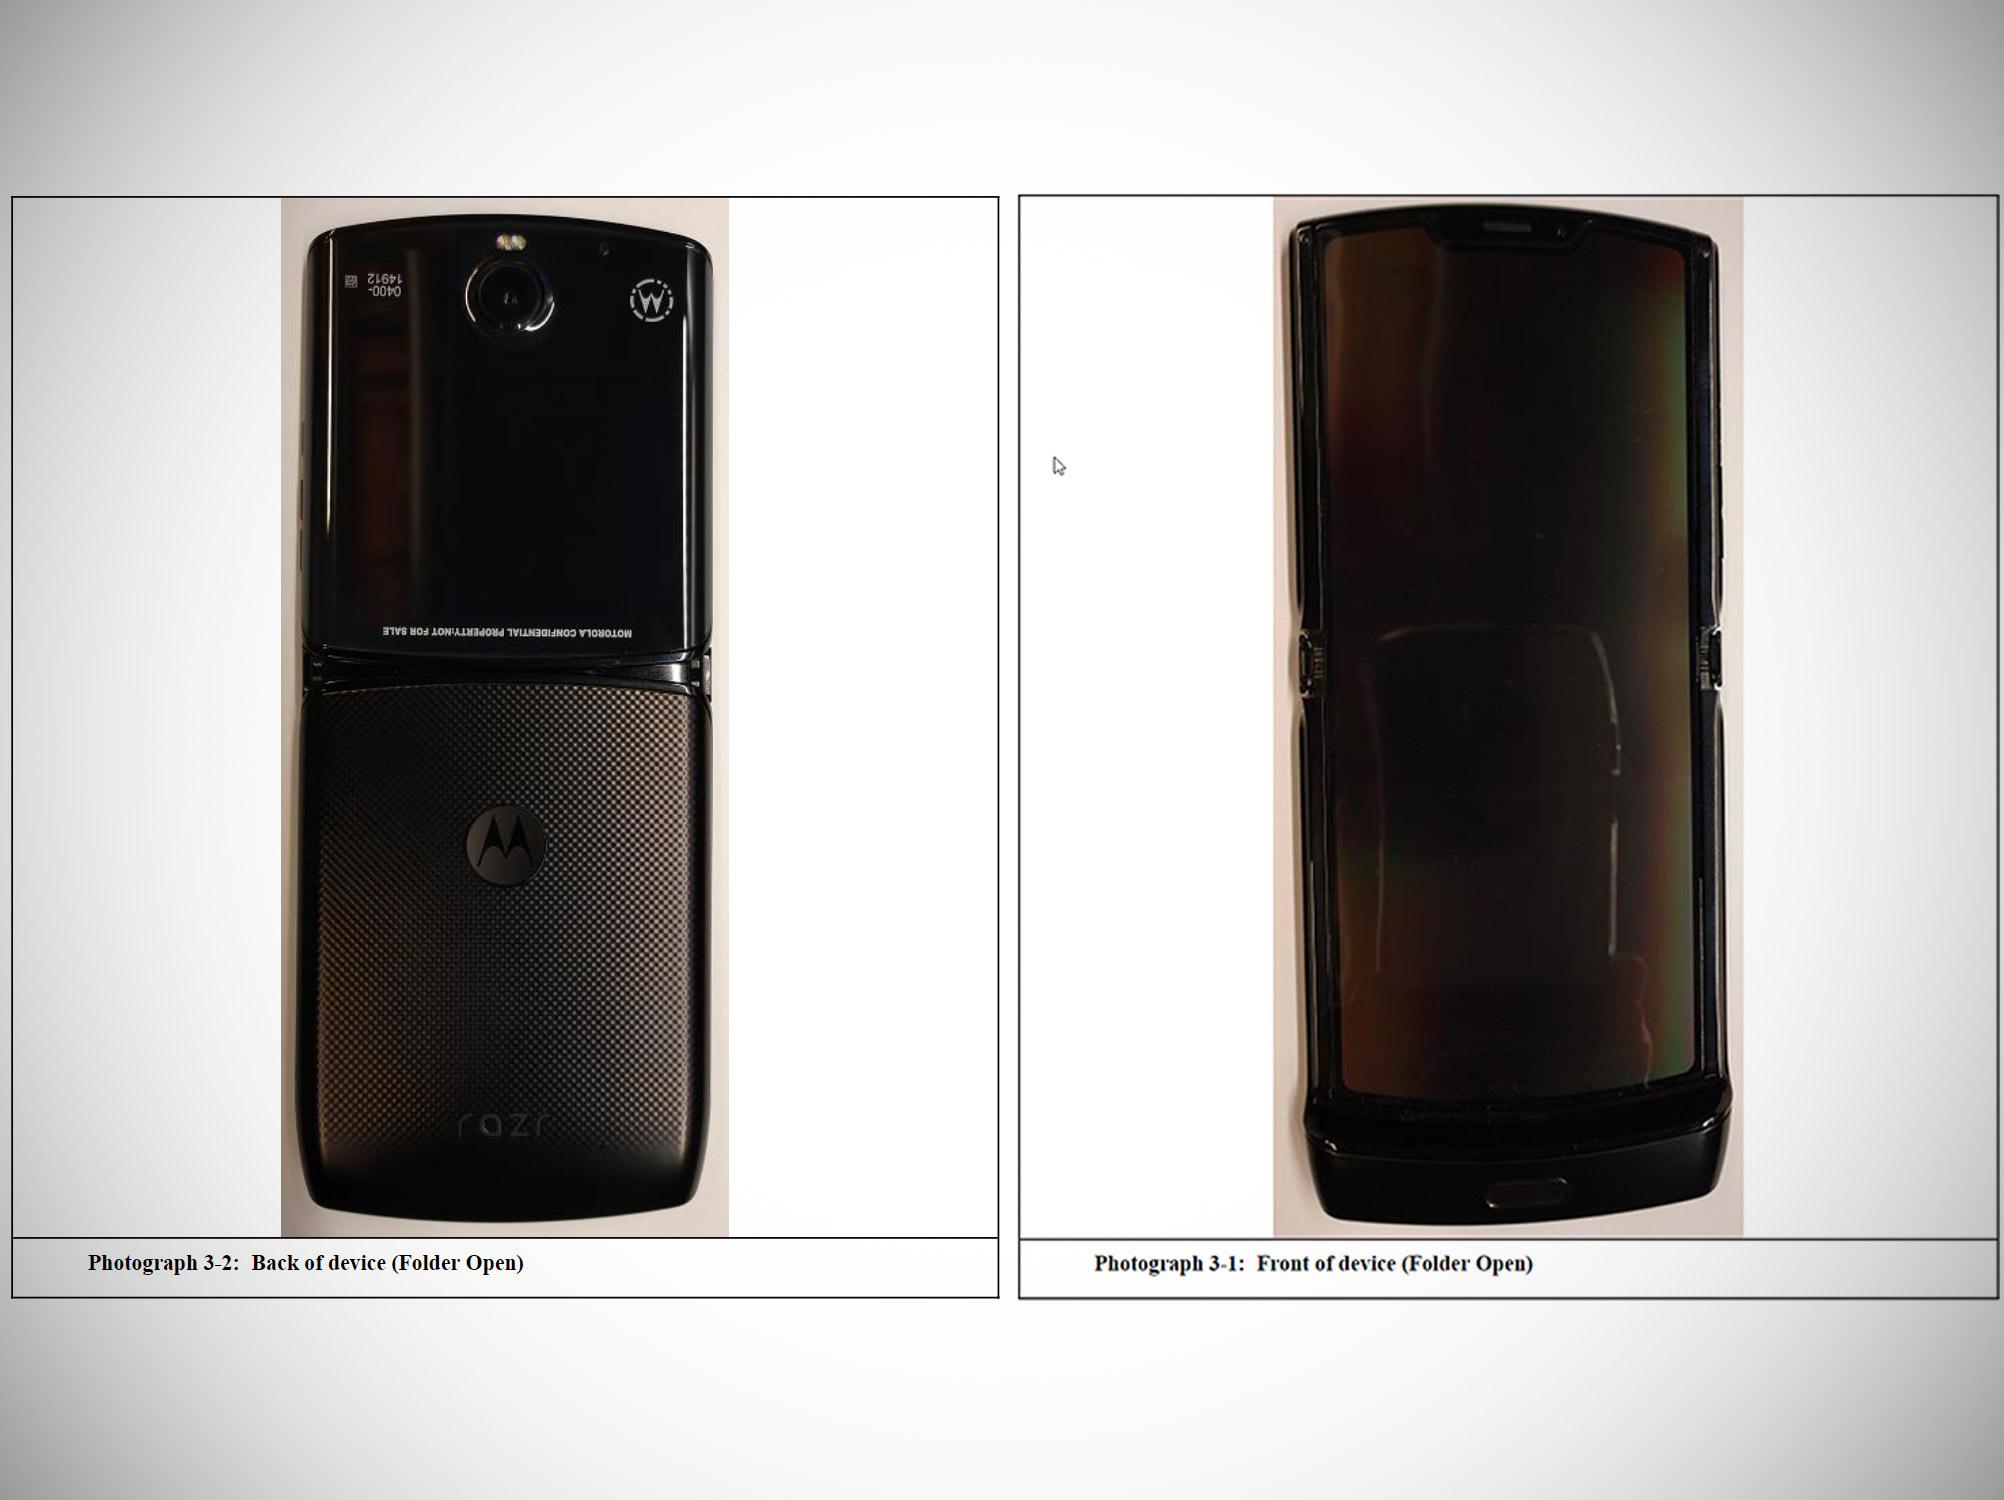 Motorola Folding RAZR Smartphone